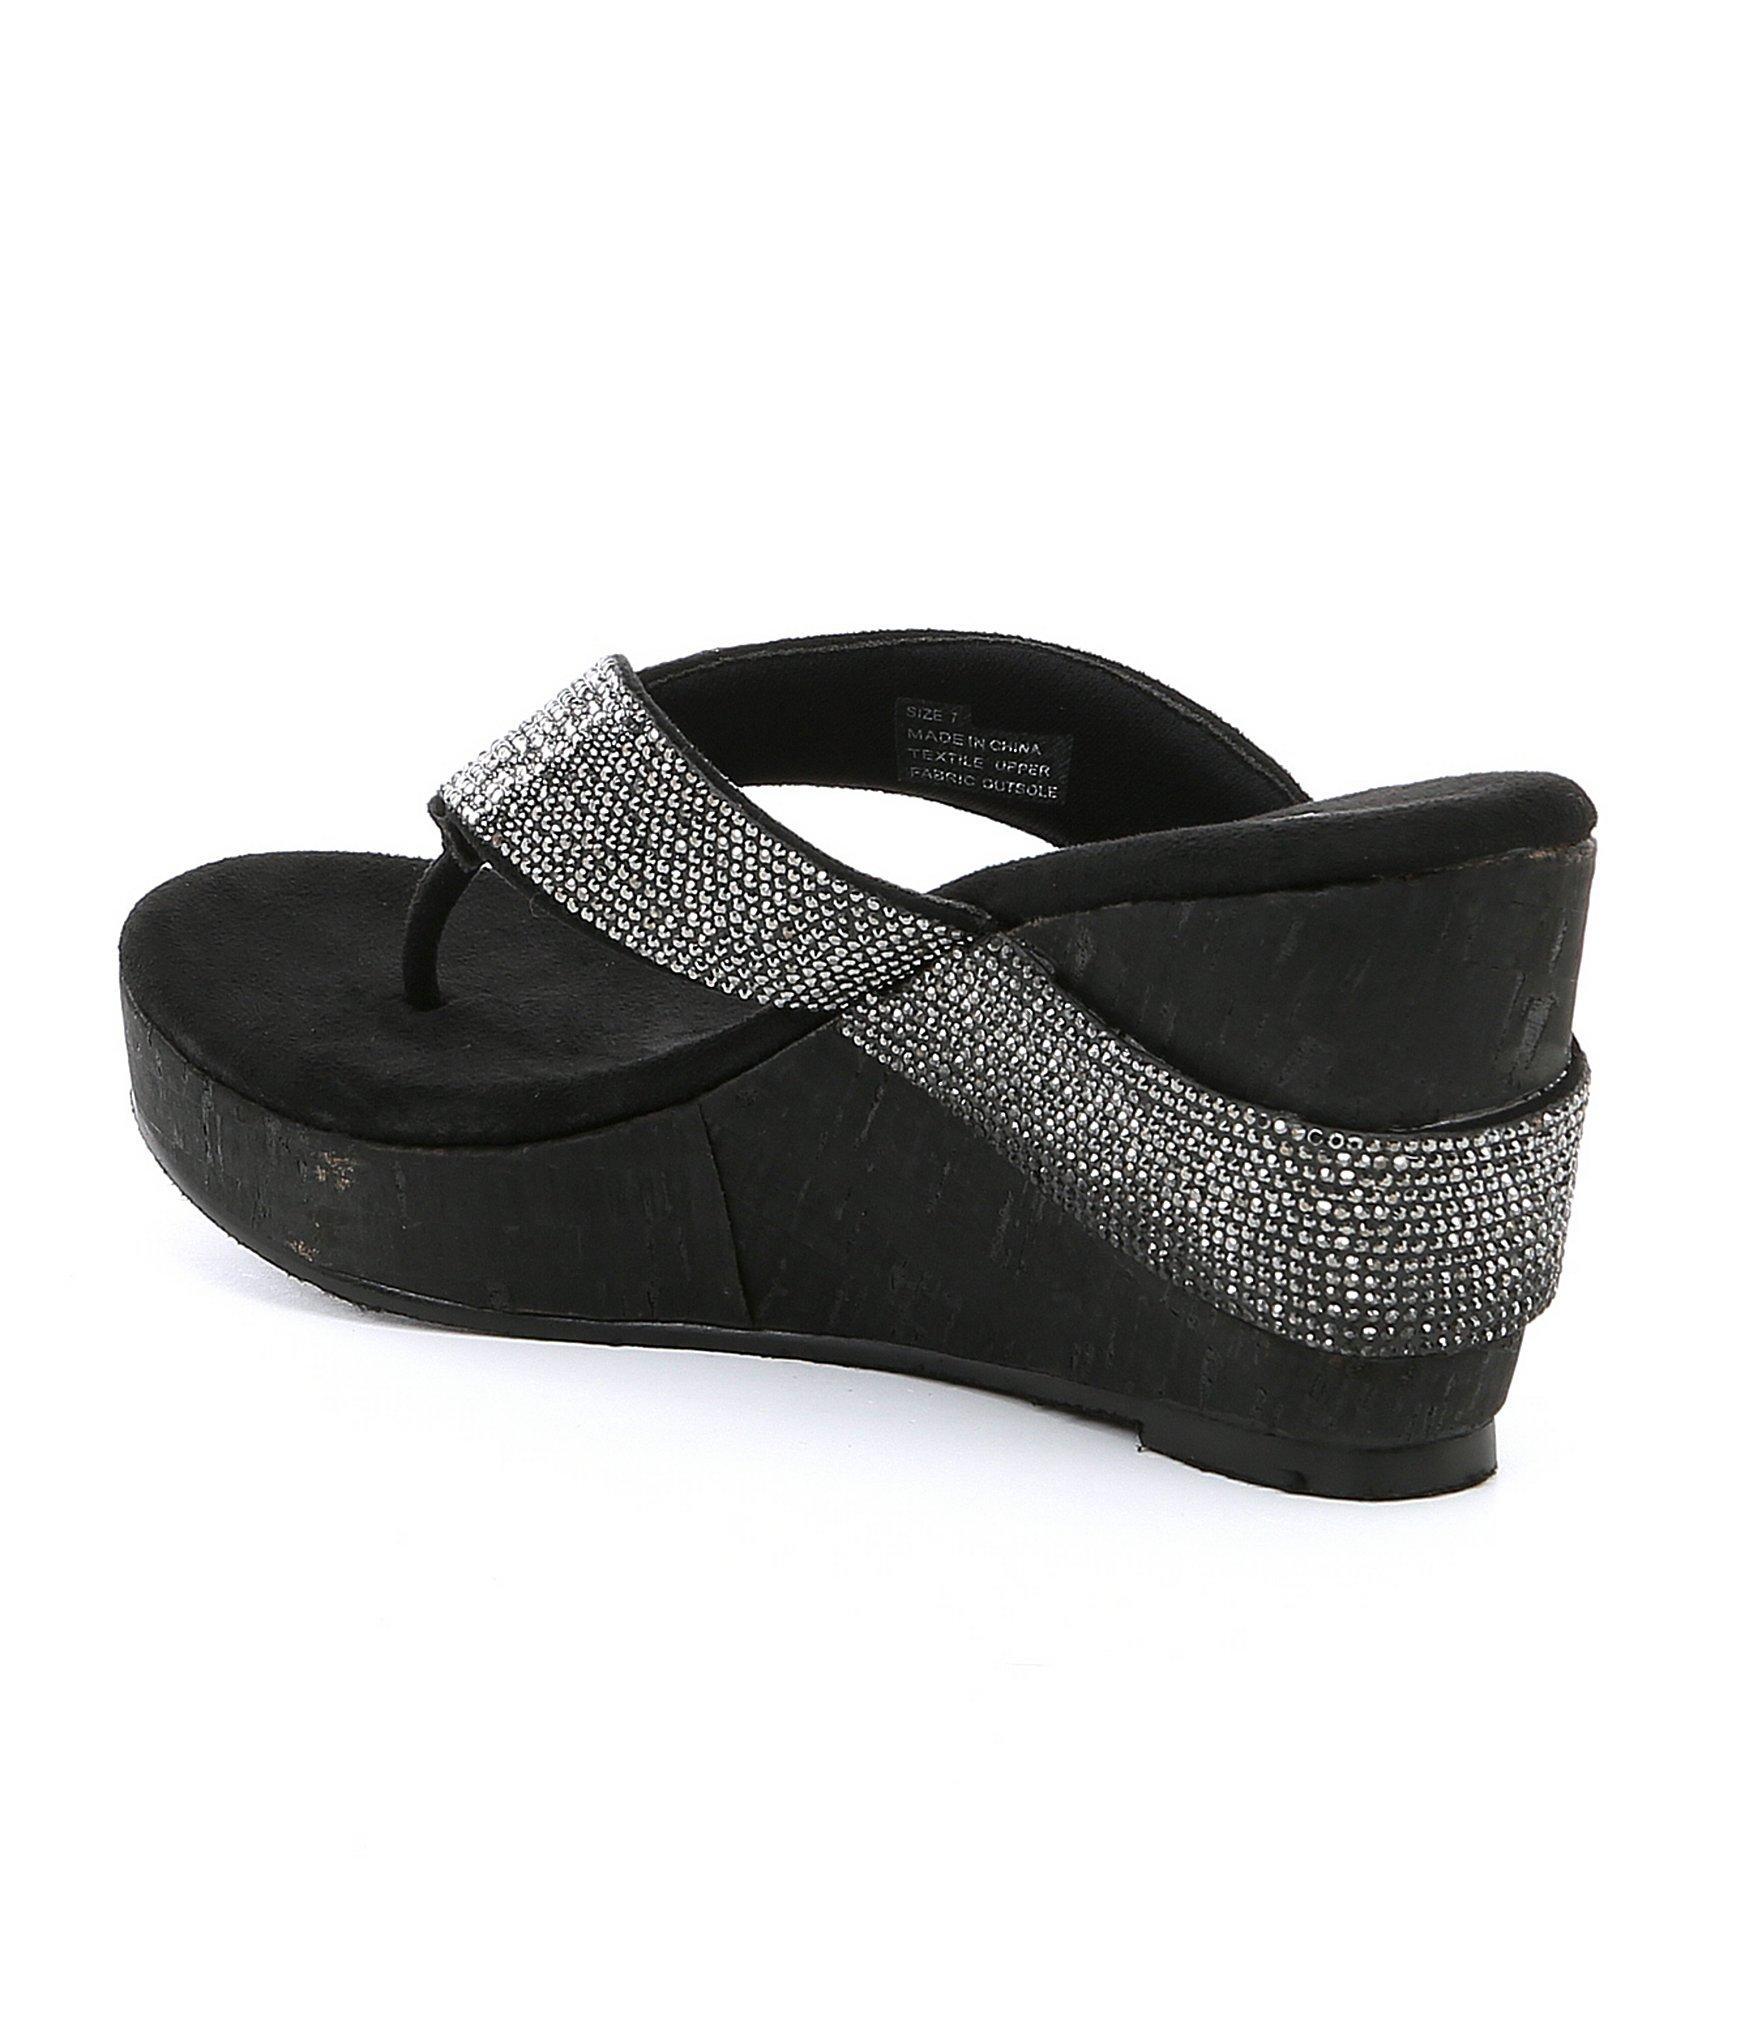 5c1e933494 Volatile - Black Cristina Rhinestone Cork-wedge Sandals - Lyst. View  fullscreen